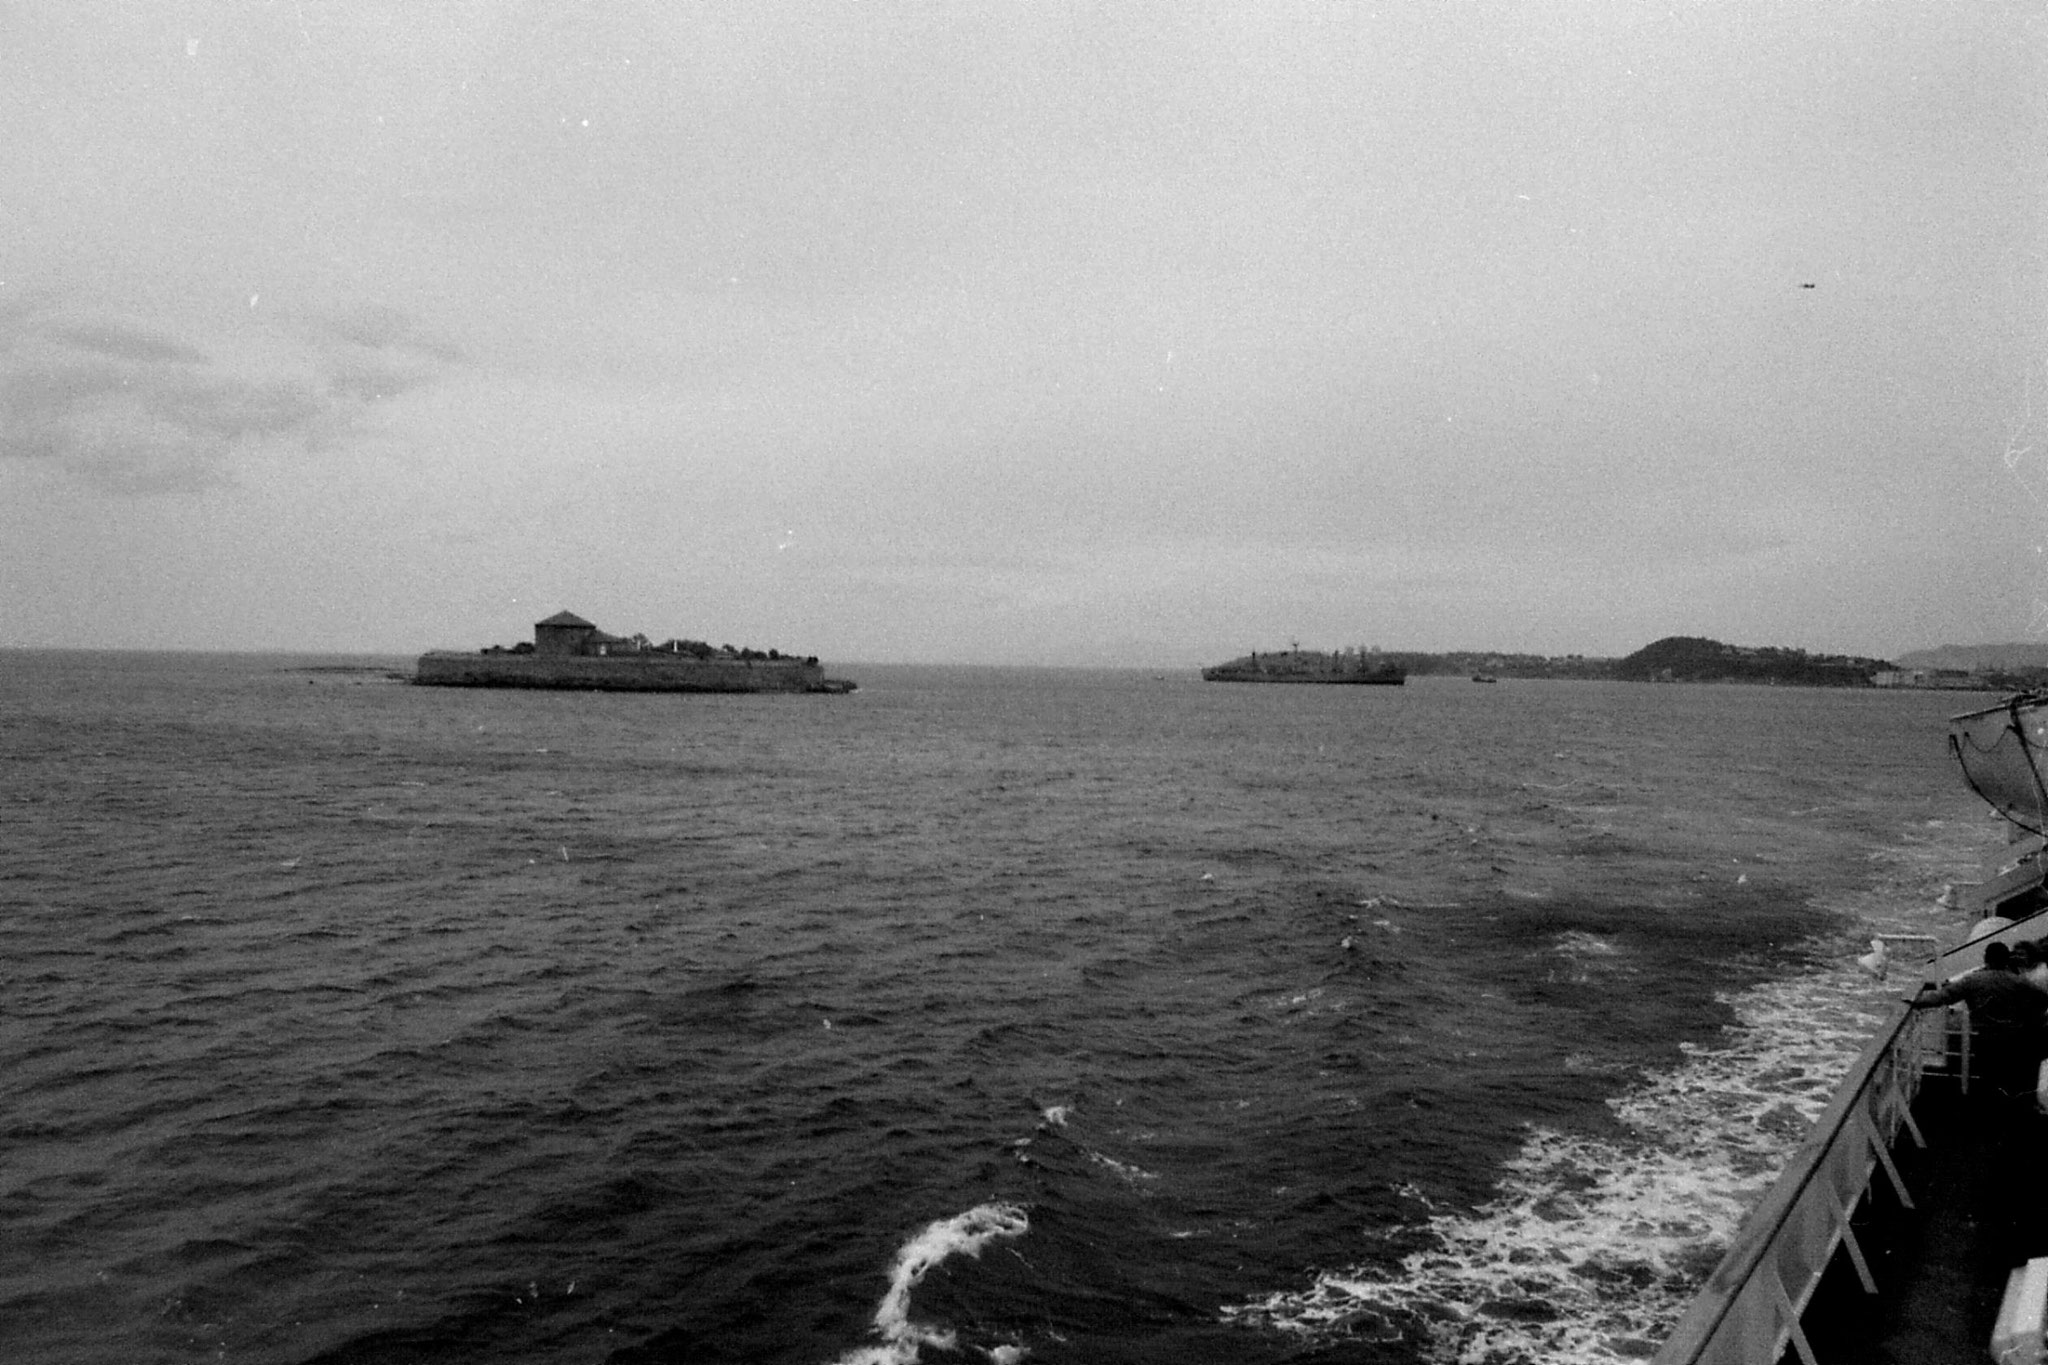 23/9/1988: 6: Stokksund sound